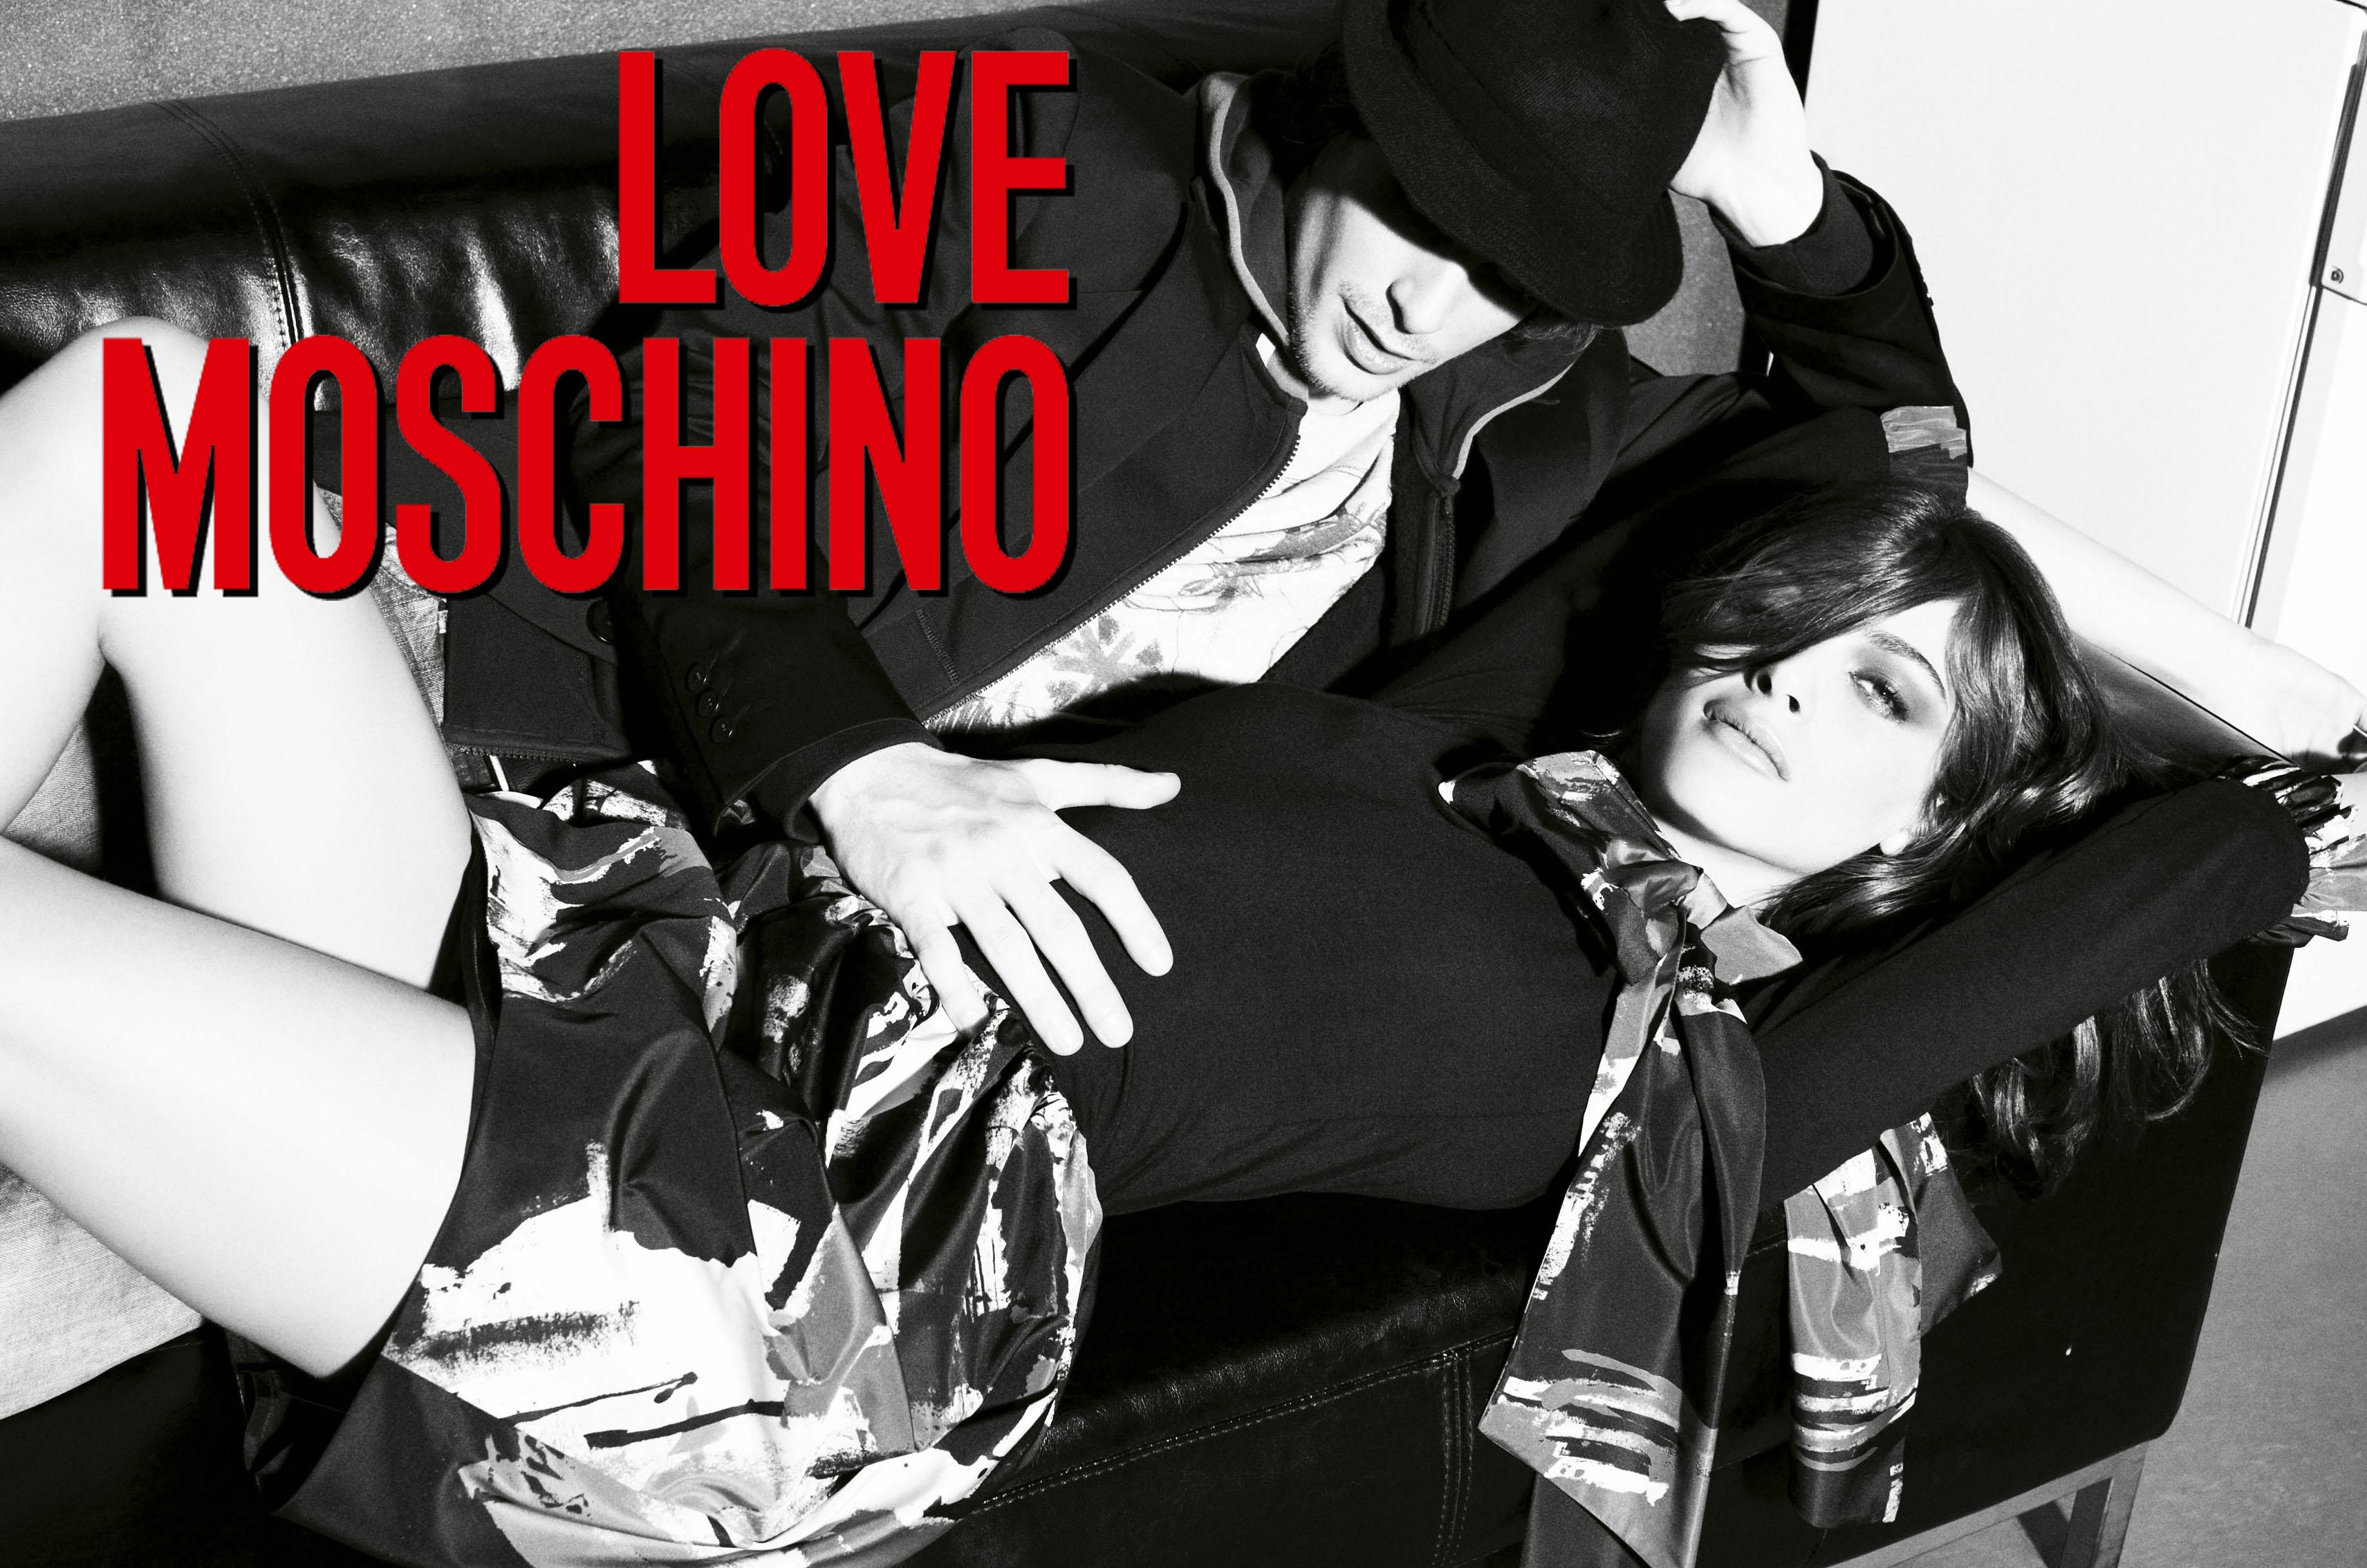 Love Moschino FW 2009 | Tom Munro | Moschino | Rolling Stone Italia | Simona Melegari | Numerique Retouch Photo Retouching Studio